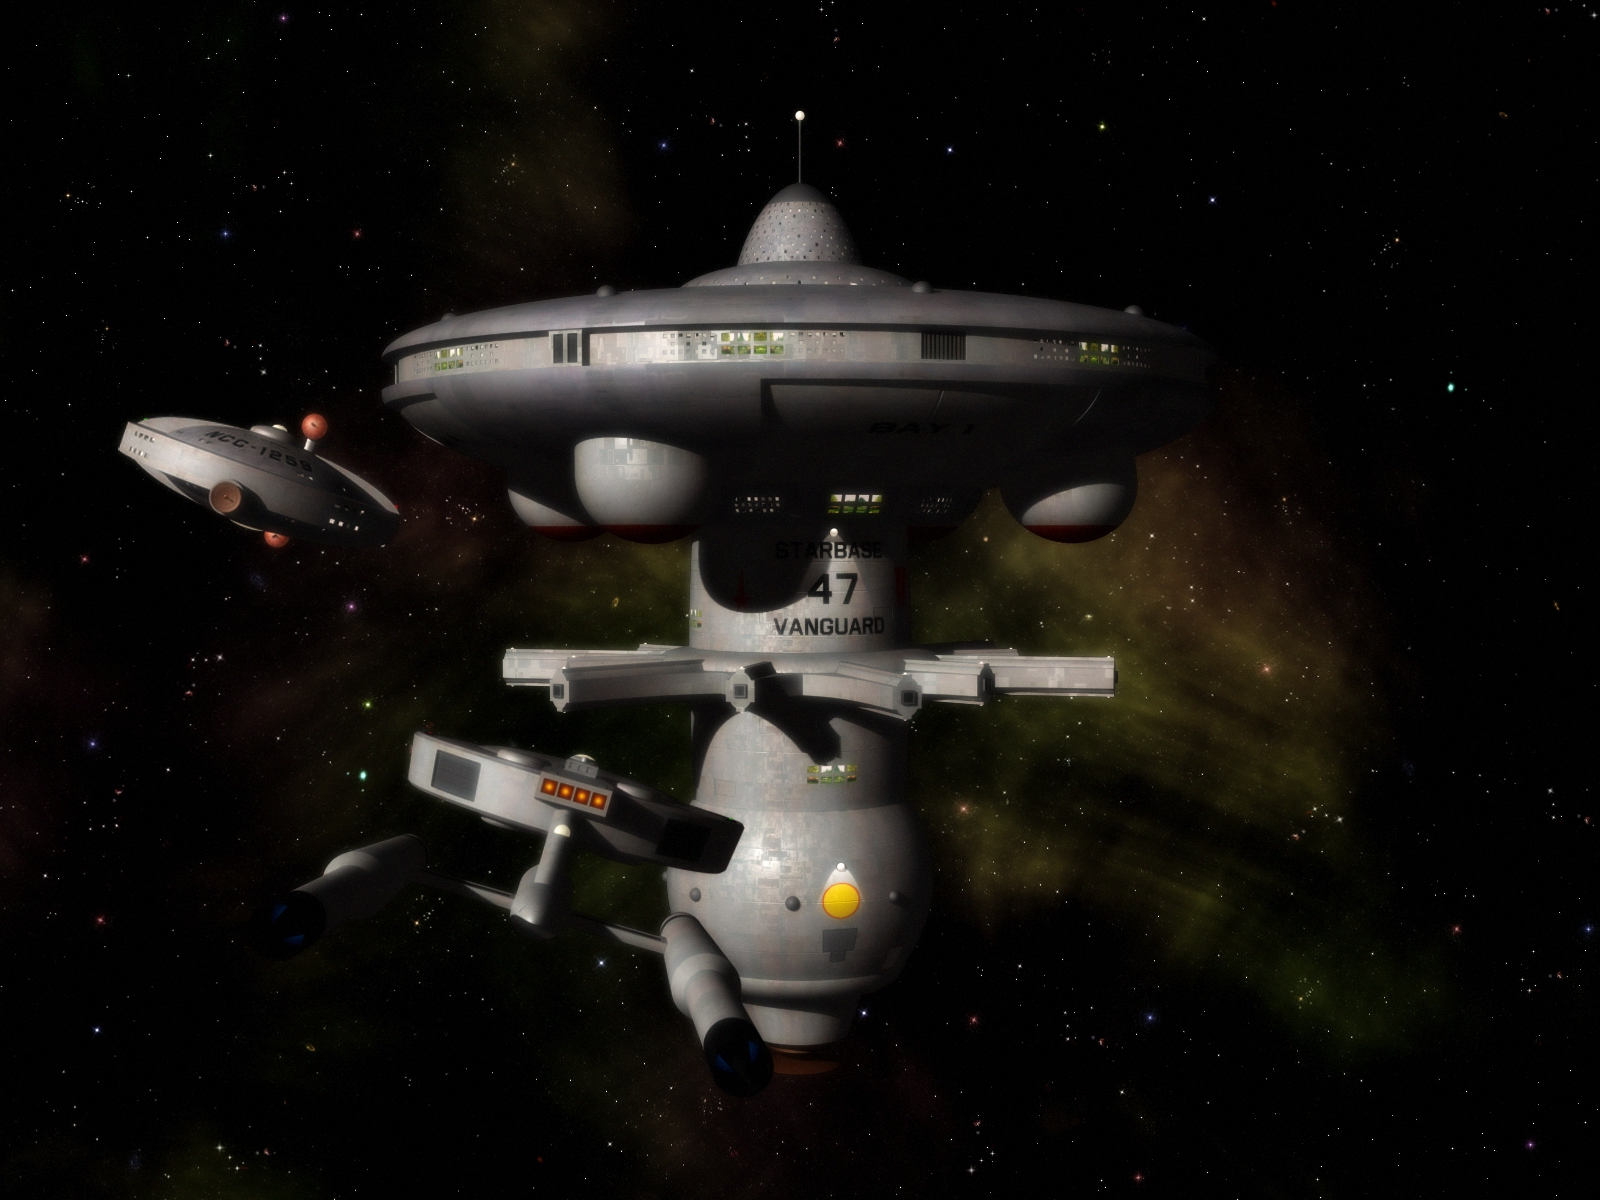 Starbase Vanguard by davemetlesits on DeviantArt